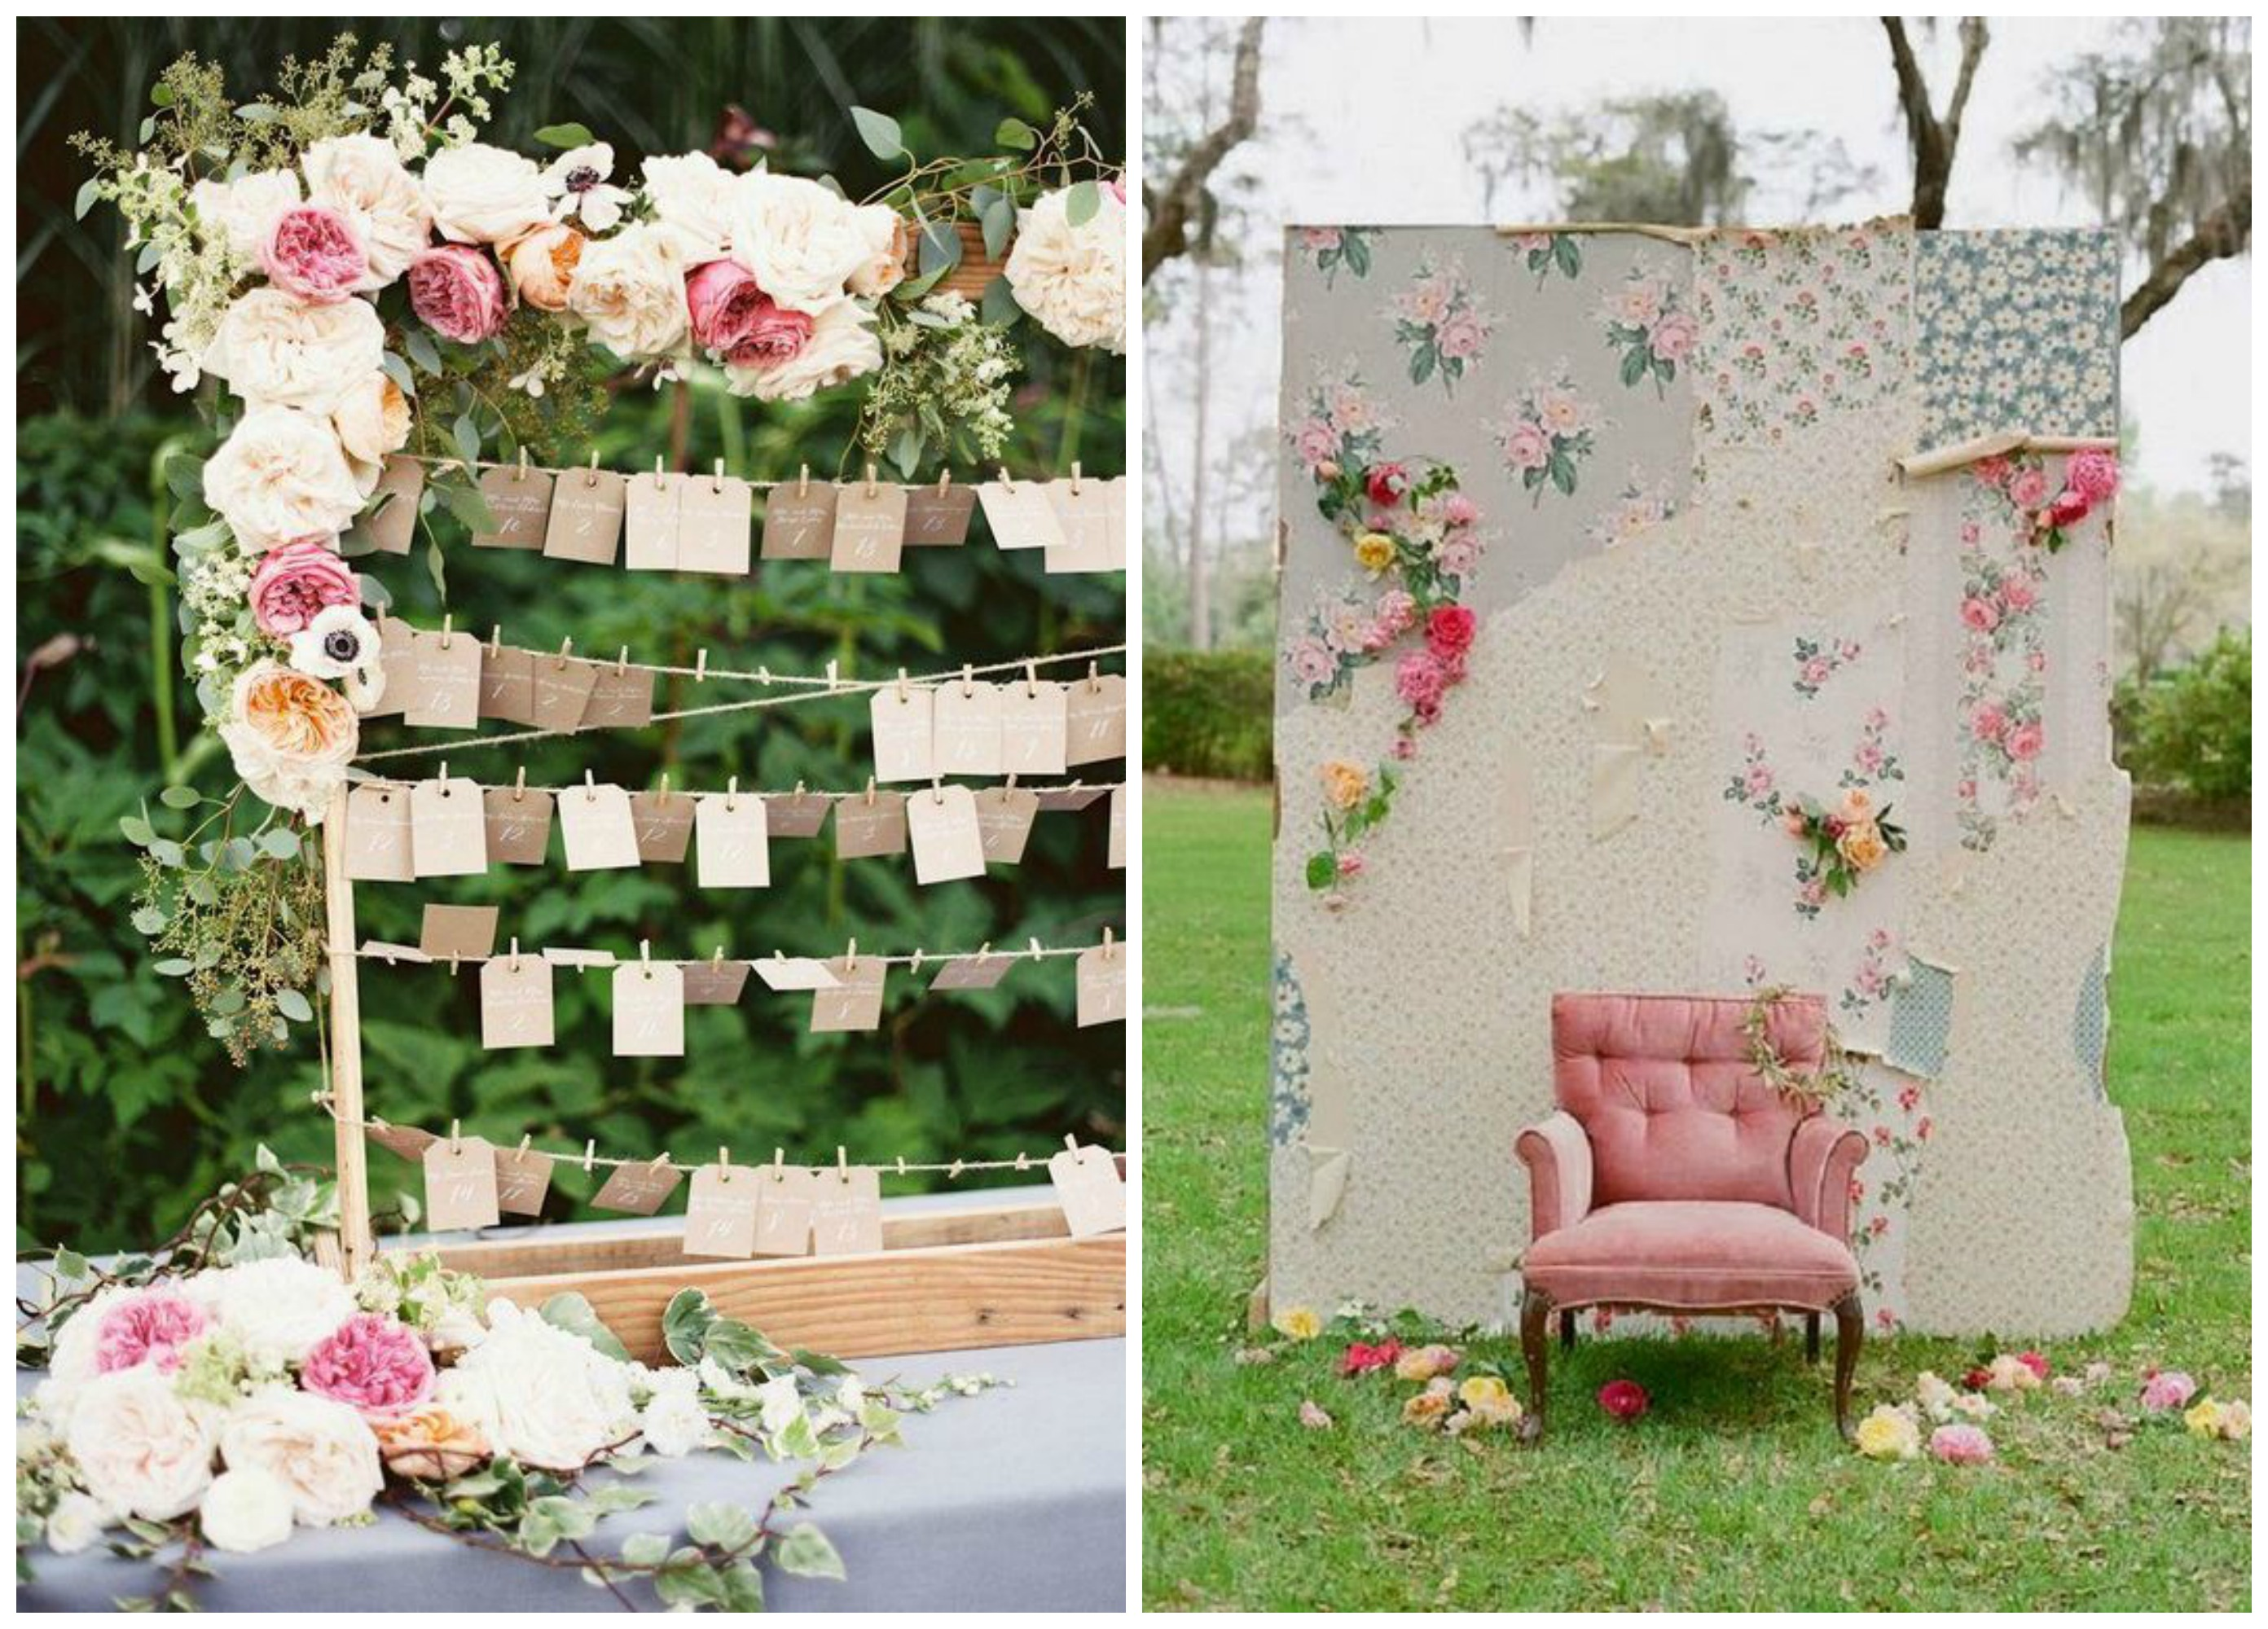 Shabby Chic Wedding Styling Ideas